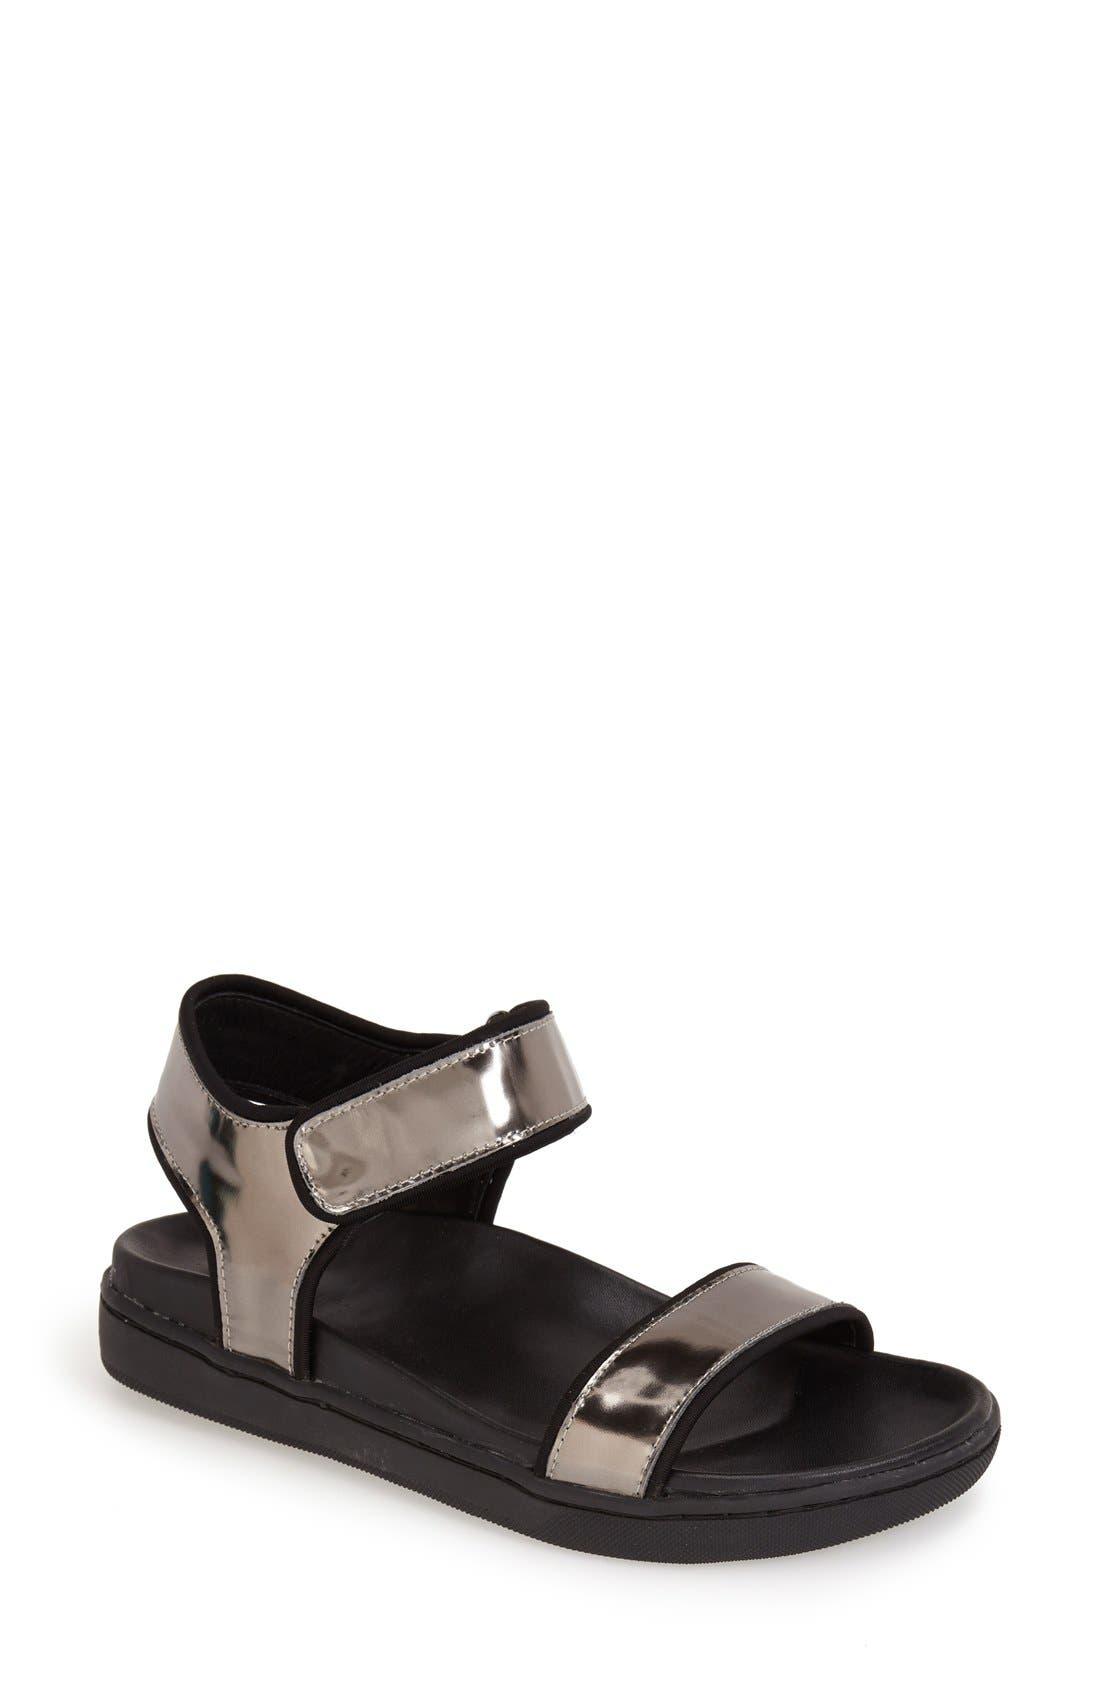 Alternate Image 1 Selected - Ateljé 71 'Astra' Two Strap Sandal (Women)